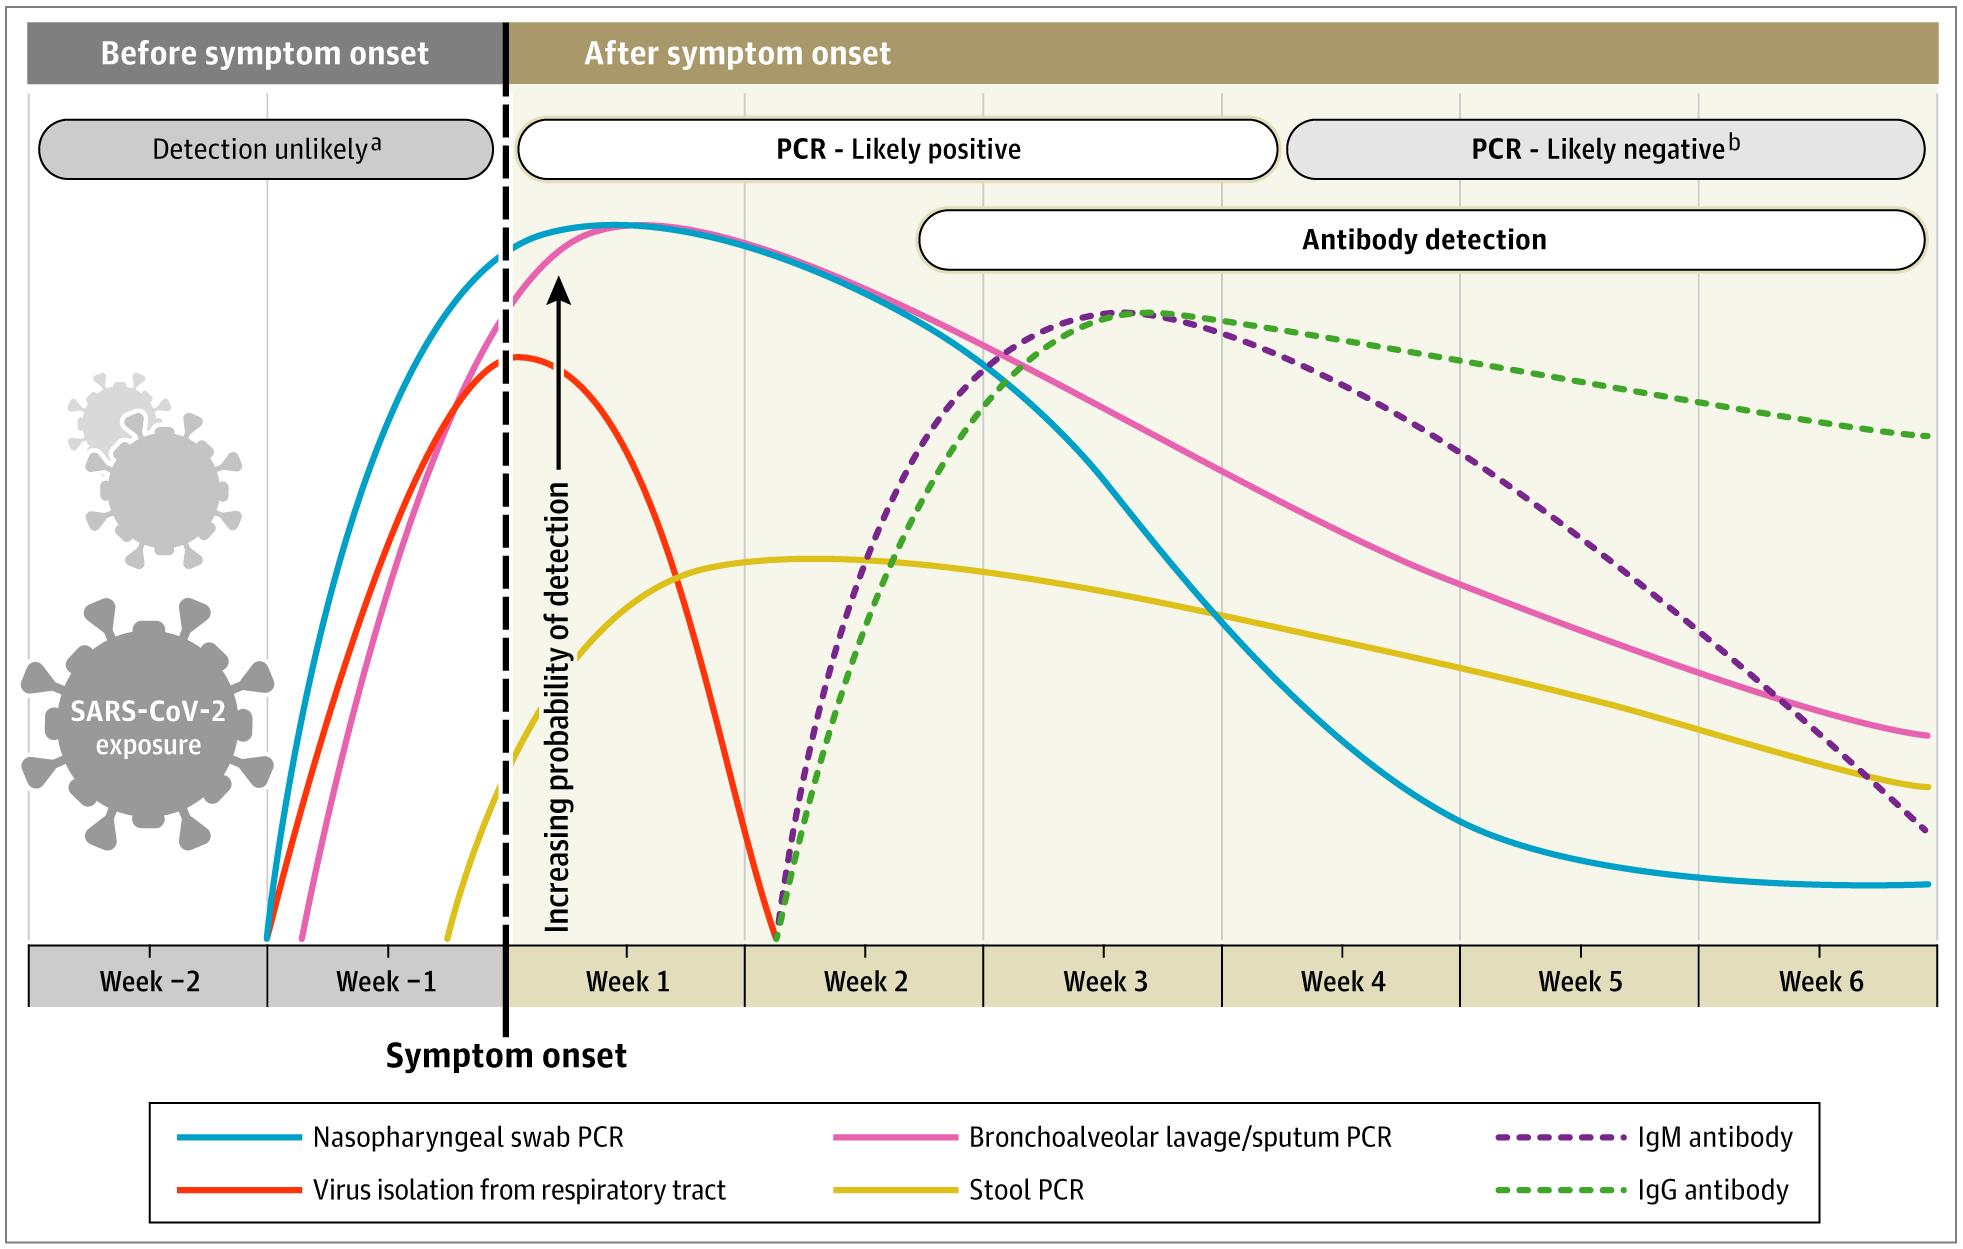 COVID-19 Onset of Symptoms Timeline